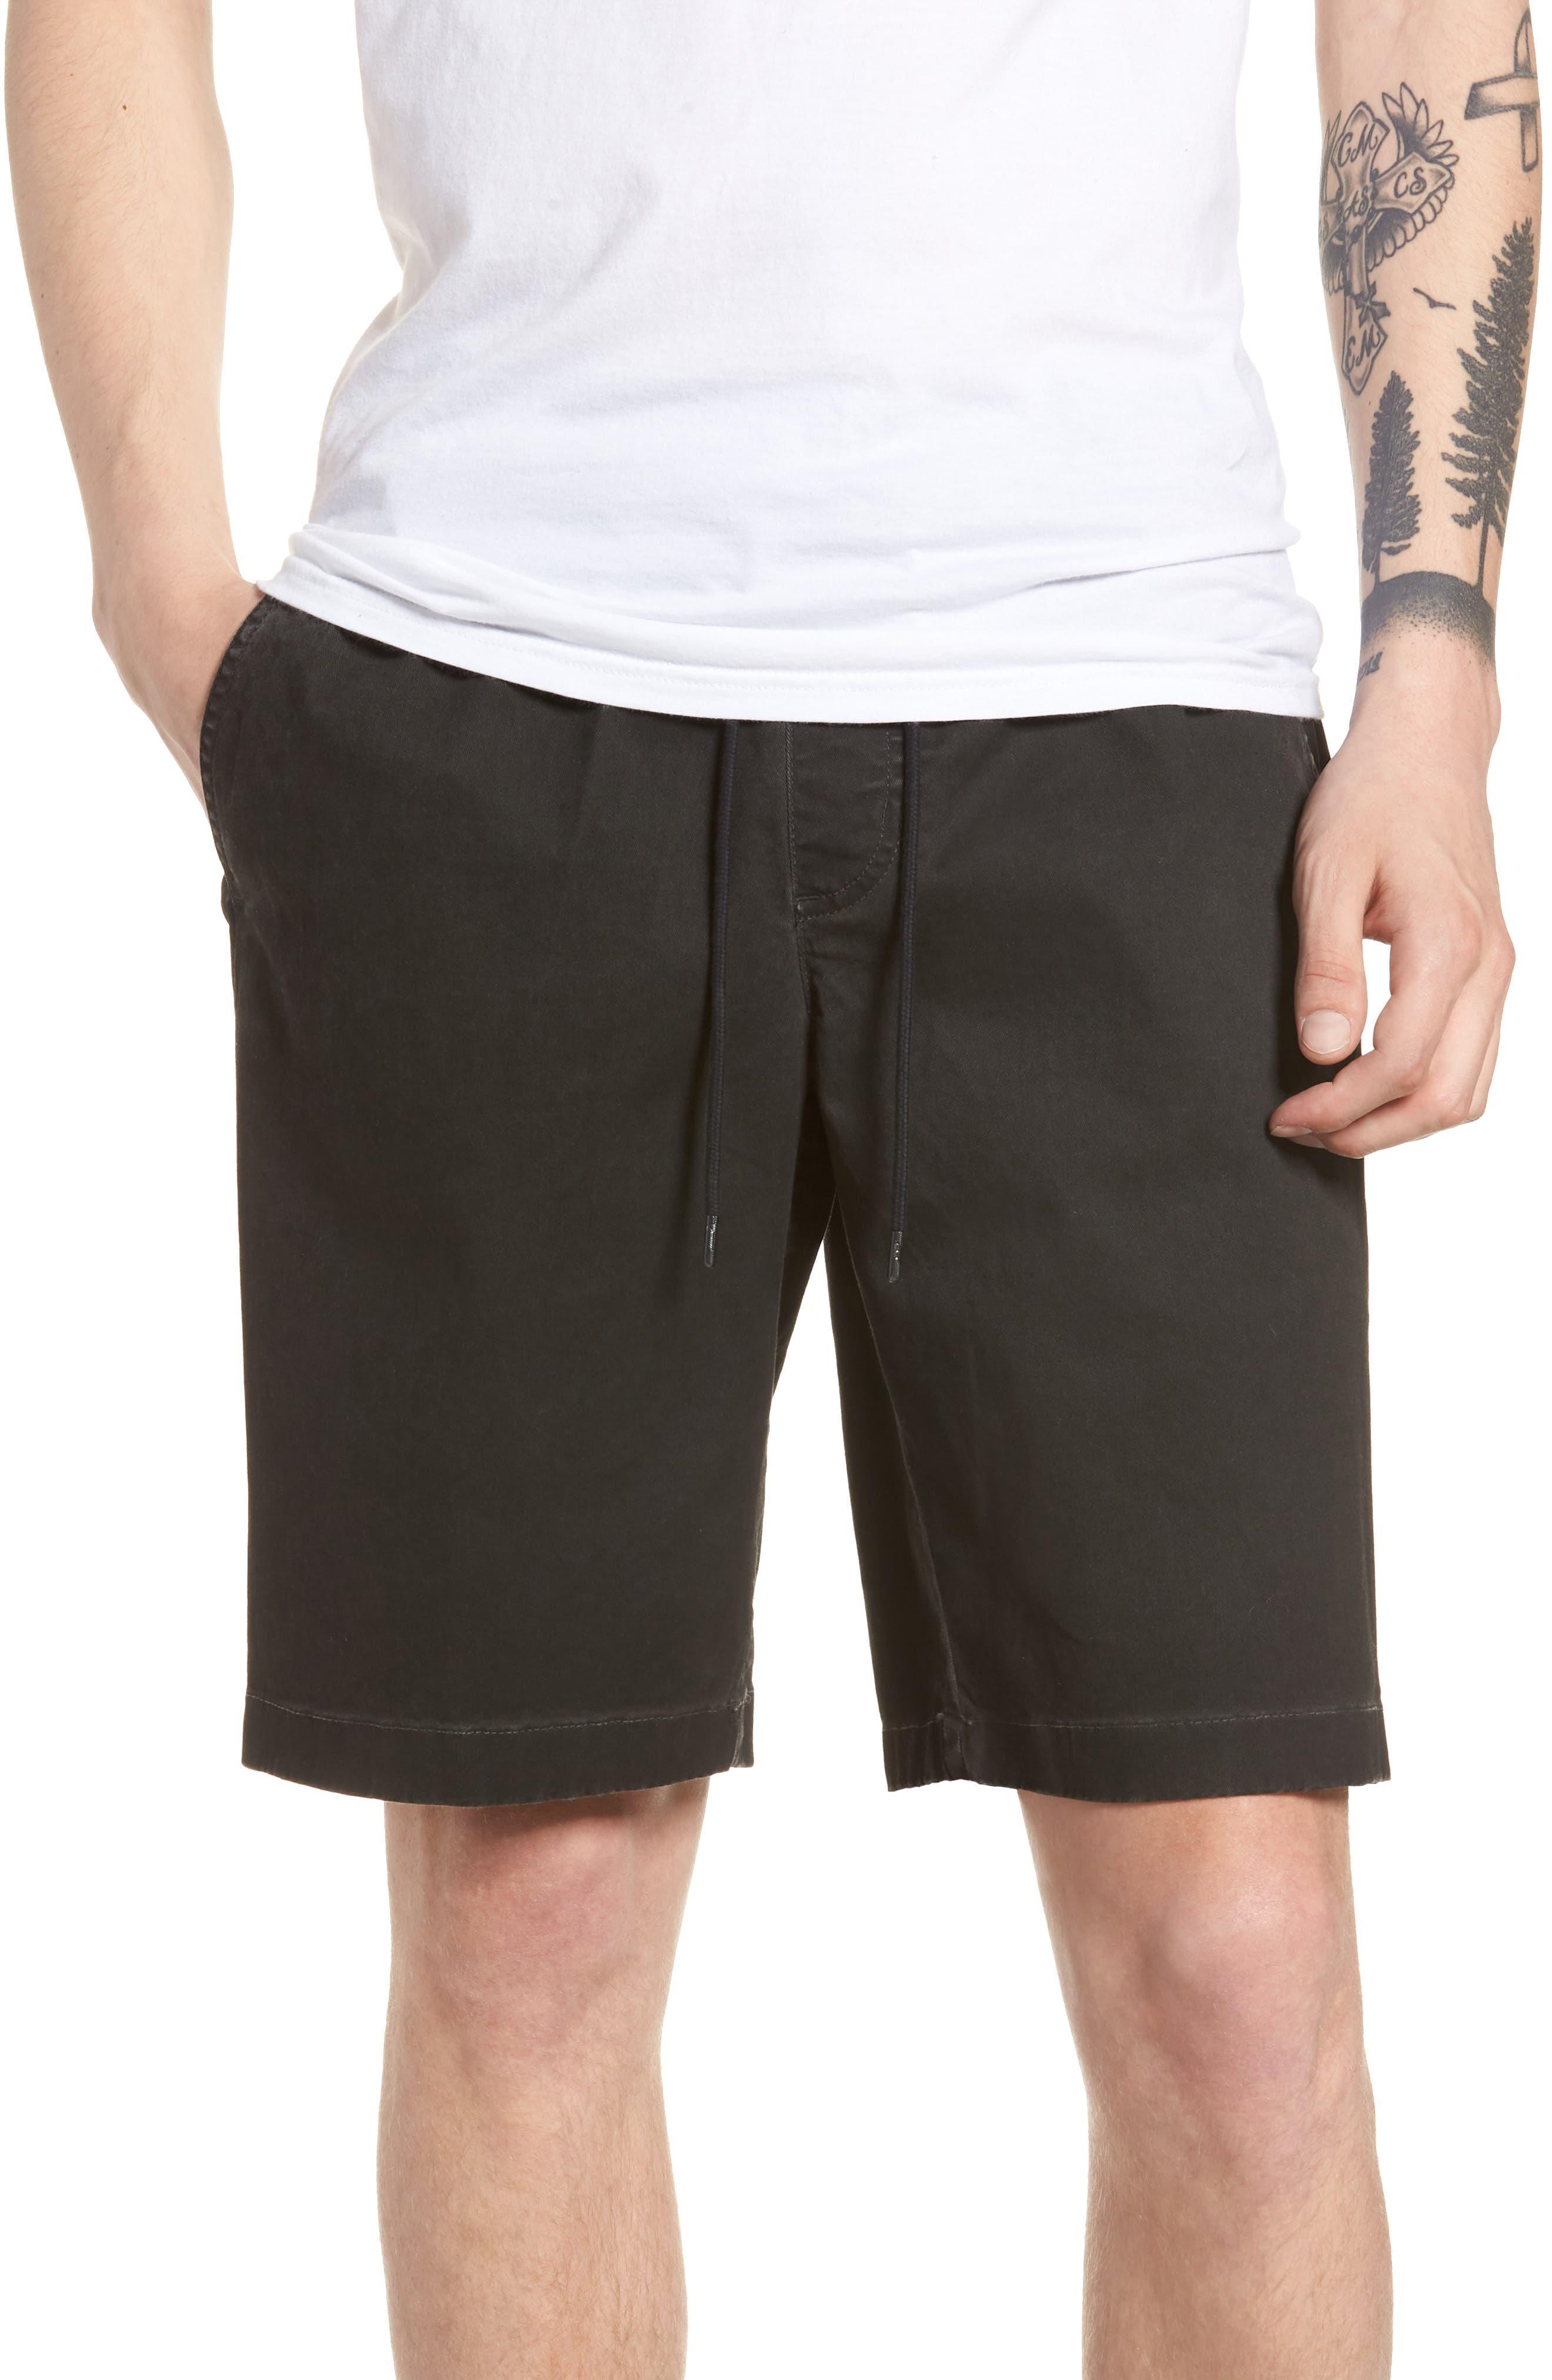 Pigment Dye Volley Shorts,                             Main thumbnail 1, color,                             Grey Onyx